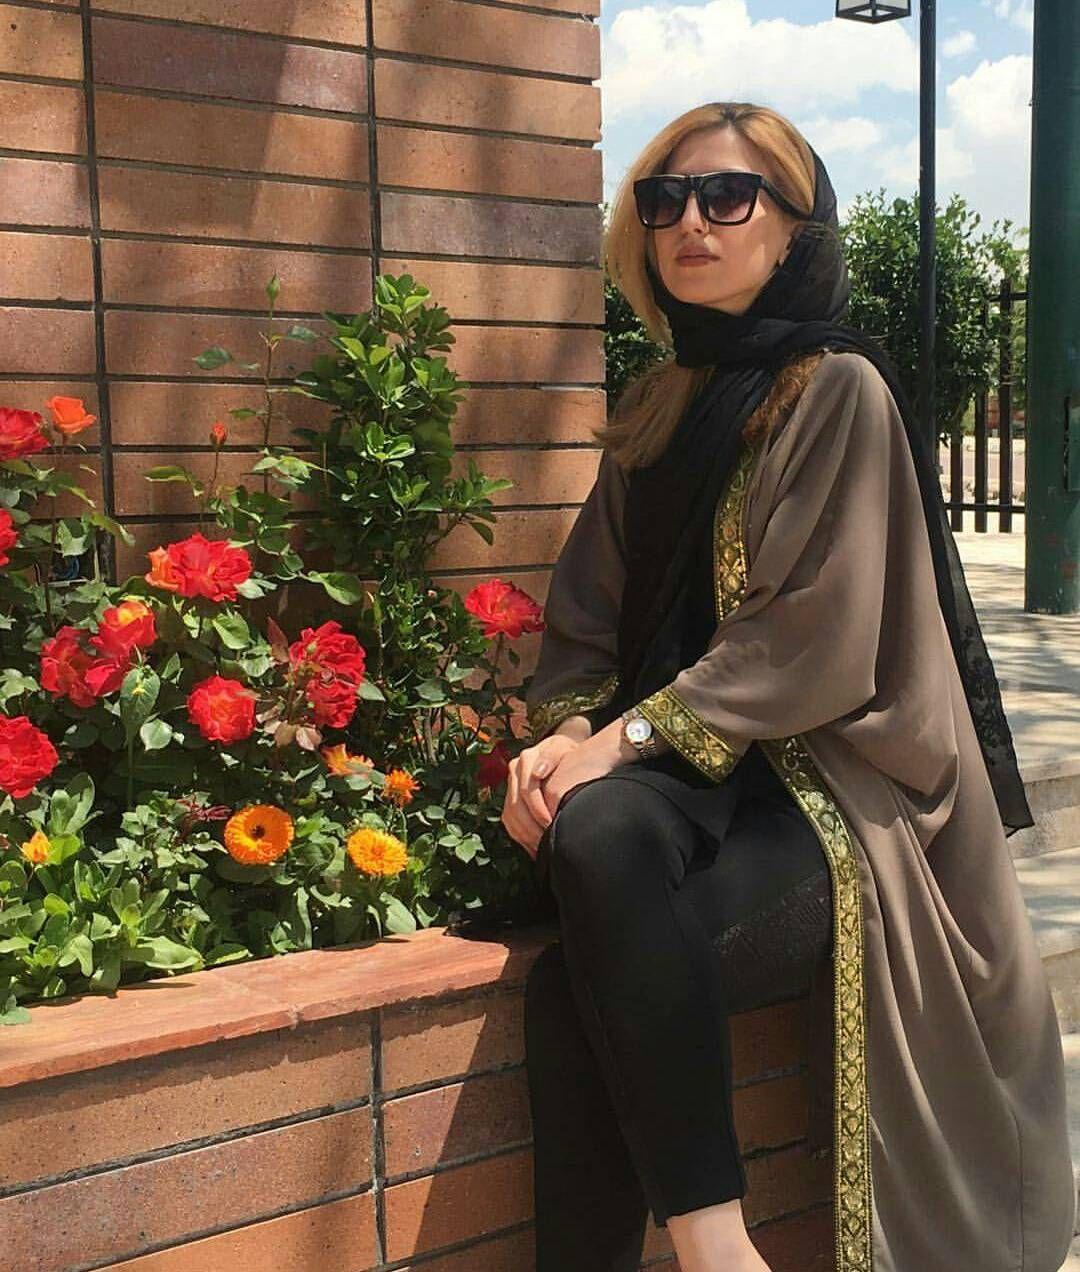 Model معرفی خیاط مدل عکاس Manteaustagemaison تبلیغات Manteaustage در اینستاگرام بیش از هزار سه کانال بالای هزار عضو Fashion Persian Girls Model